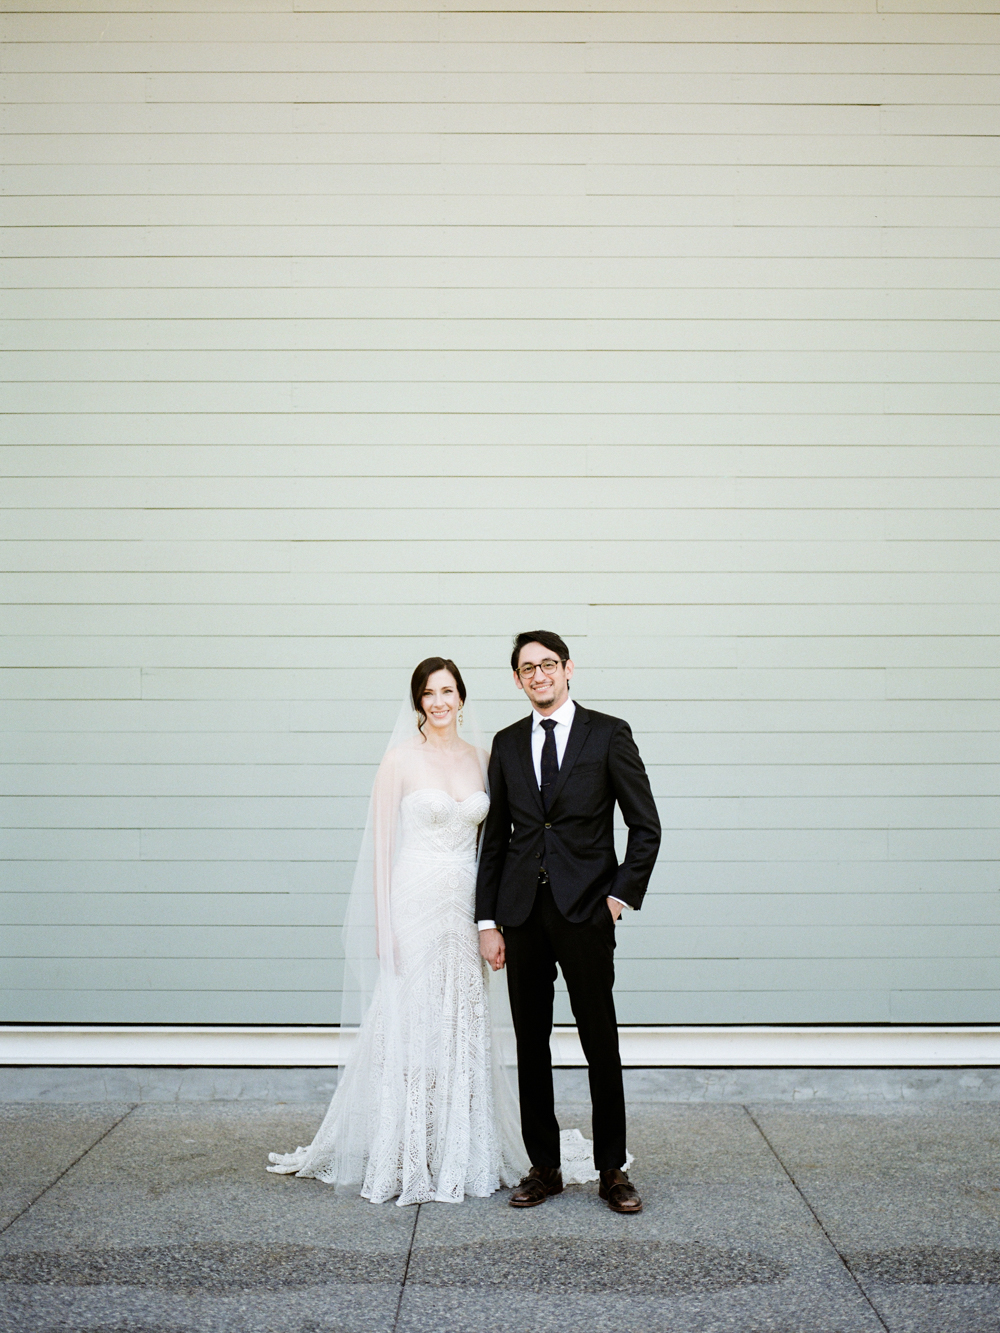 fall wedding at rothko chapel- houston wedding photographer-christine gosch - film photographer - elopement photographer- intimate wedding - lovely bride wedding gown-4.jpg